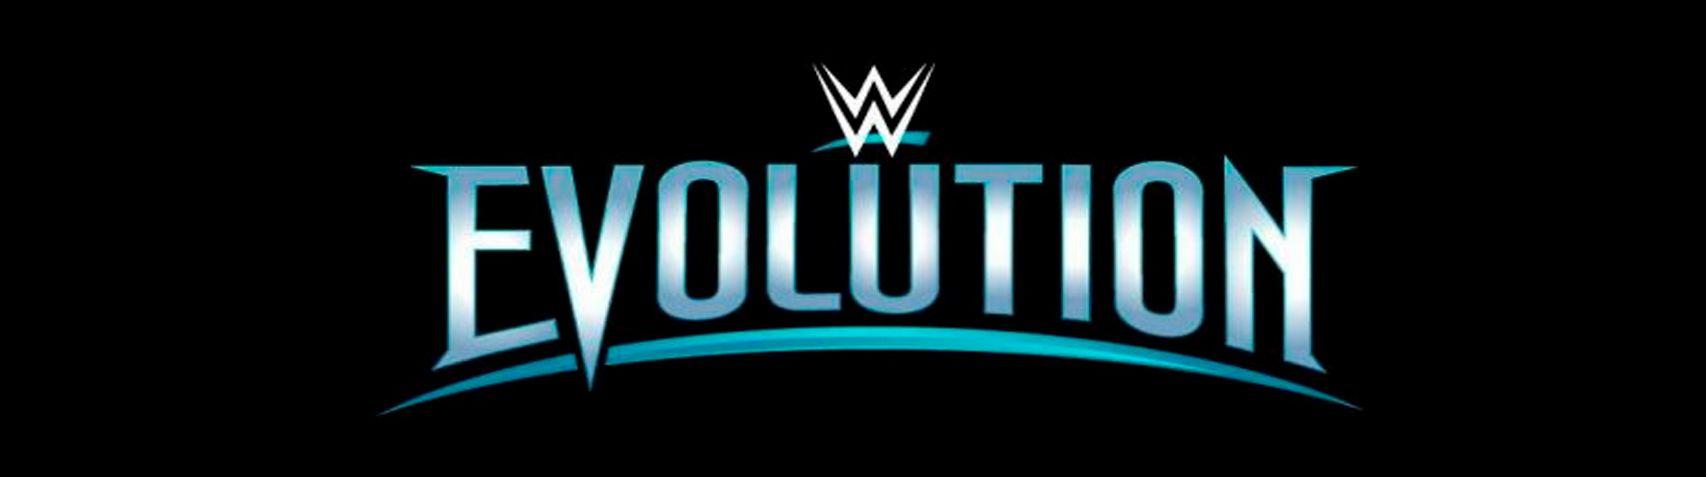 Evolution logo, ver evolution